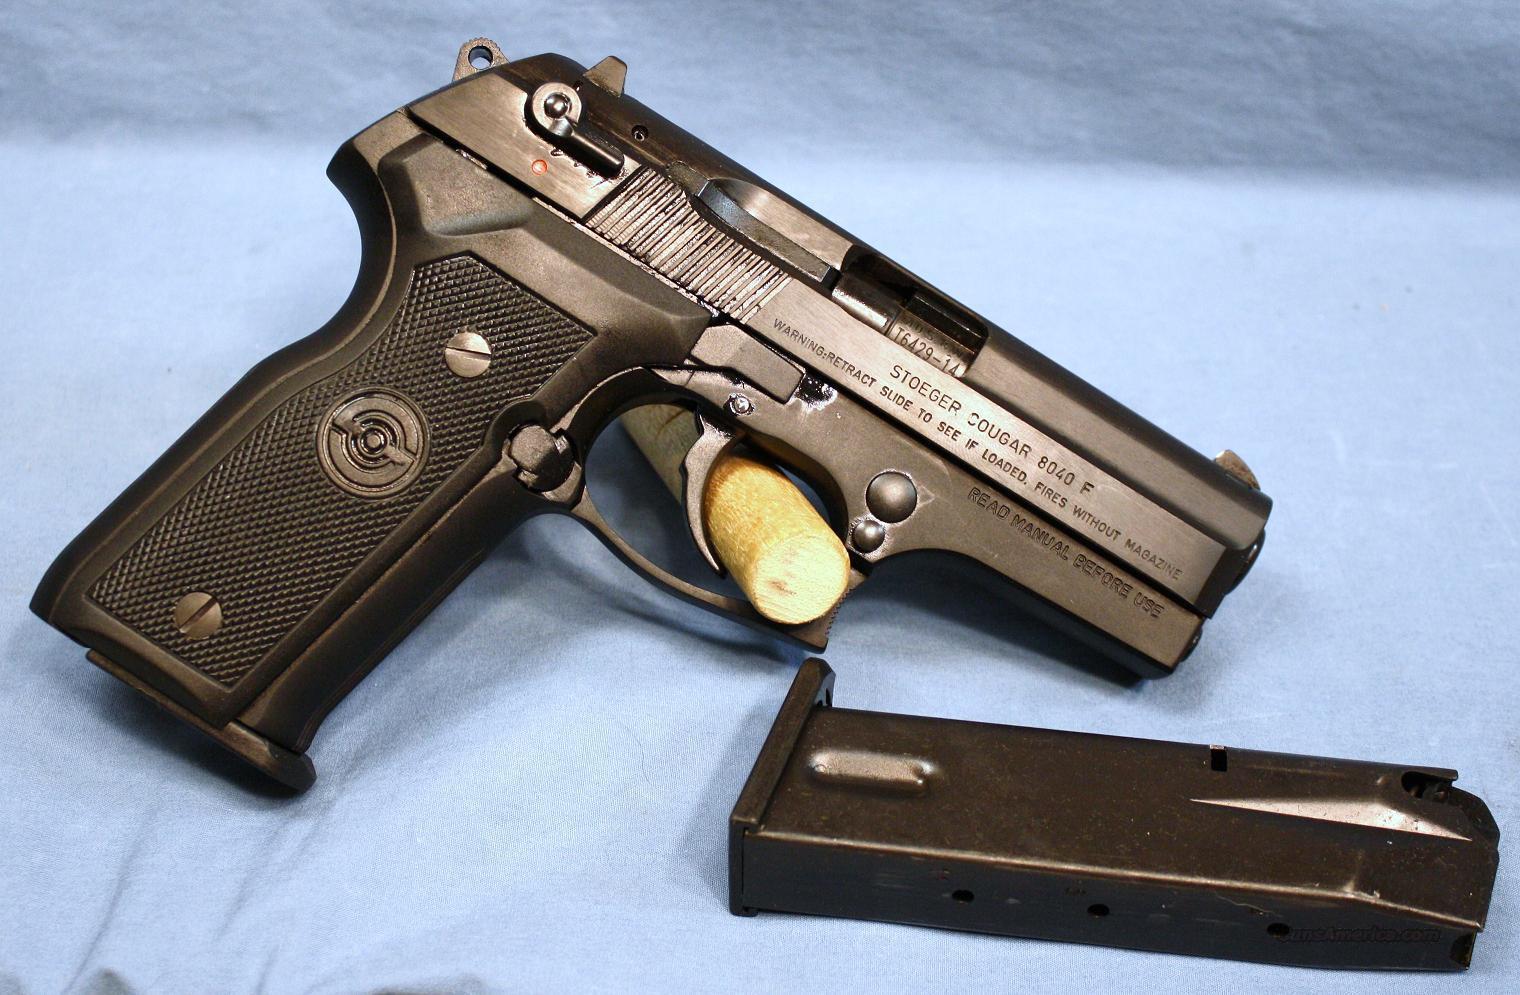 Stoeger cougar semi automatic pistol 40 s amp w guns gt pistols gt s misc